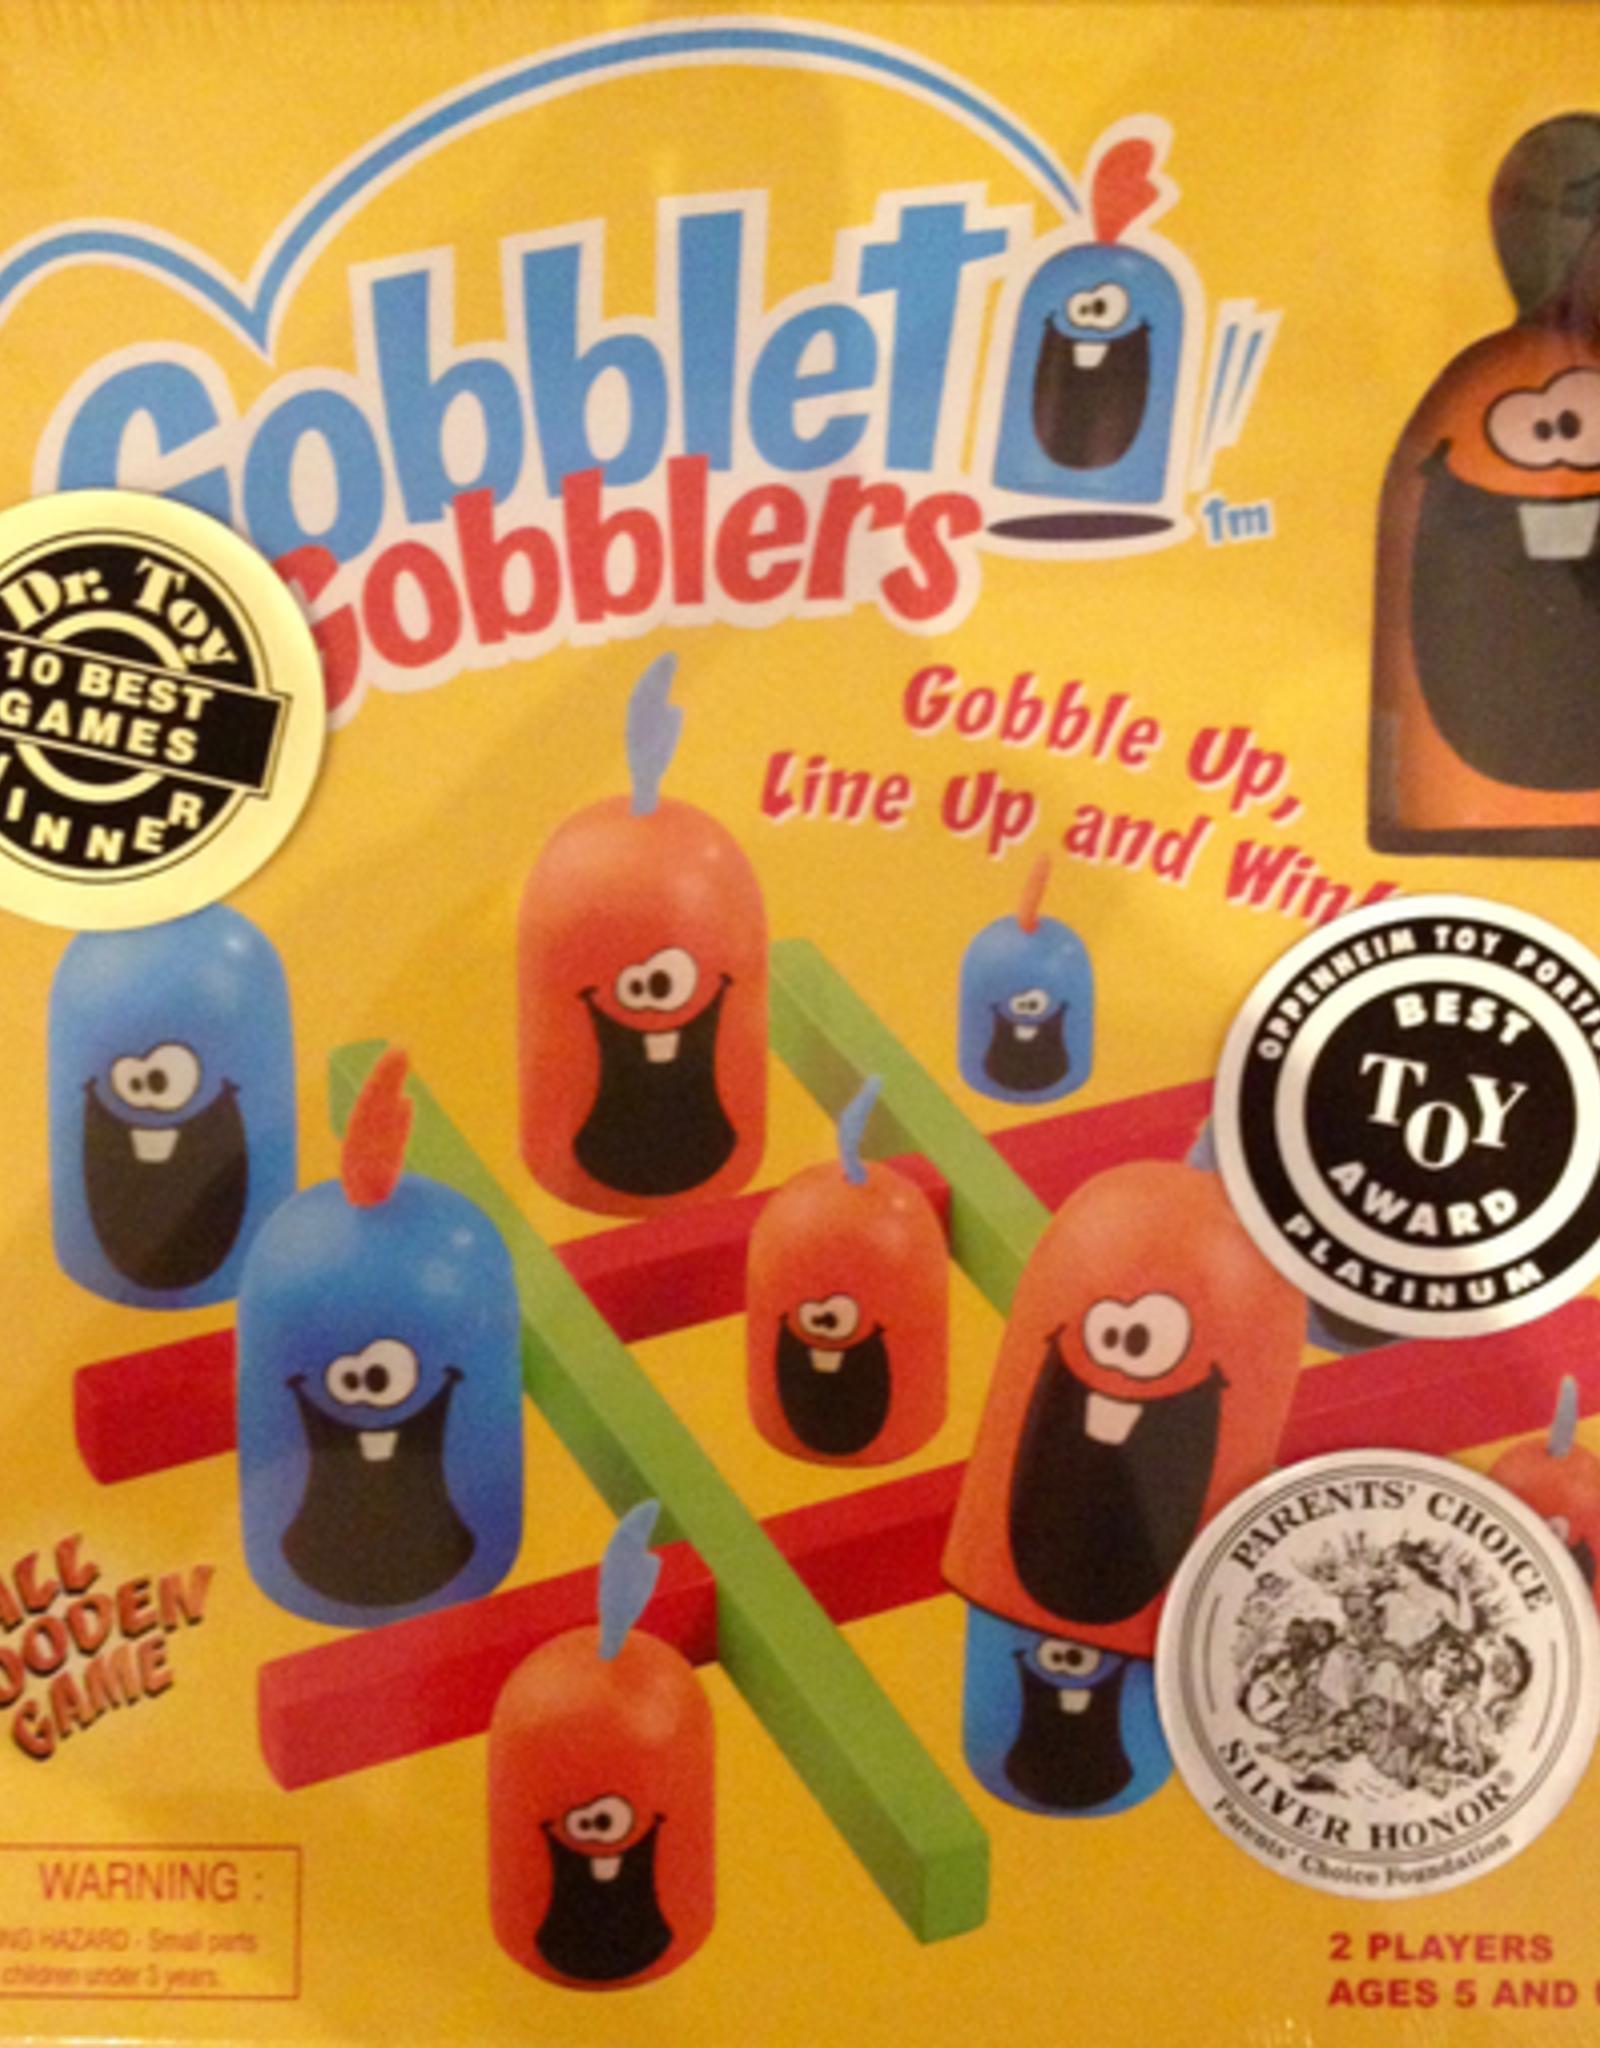 Blue Orange USA Blue Orange Gobblet Gobblers